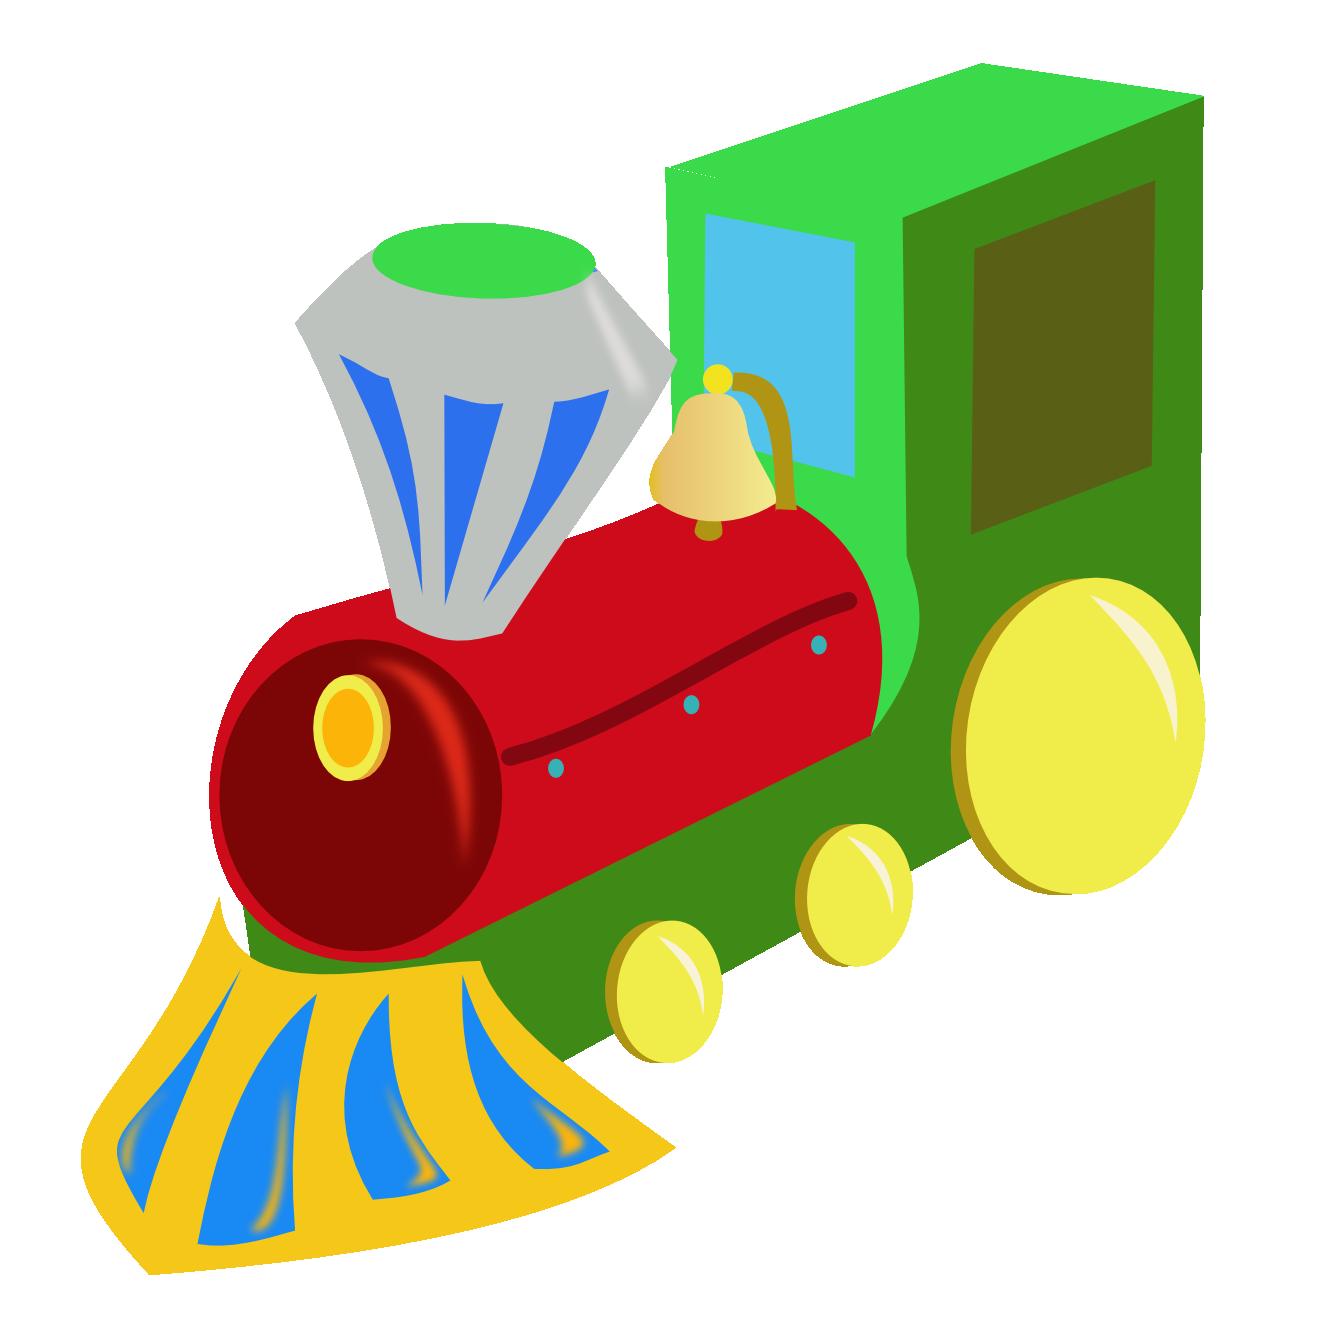 Pumpkin train clipart svg transparent stock Toy Train Clipart & Look At Toy Train Clip Art Images - ClipartLook.com svg transparent stock